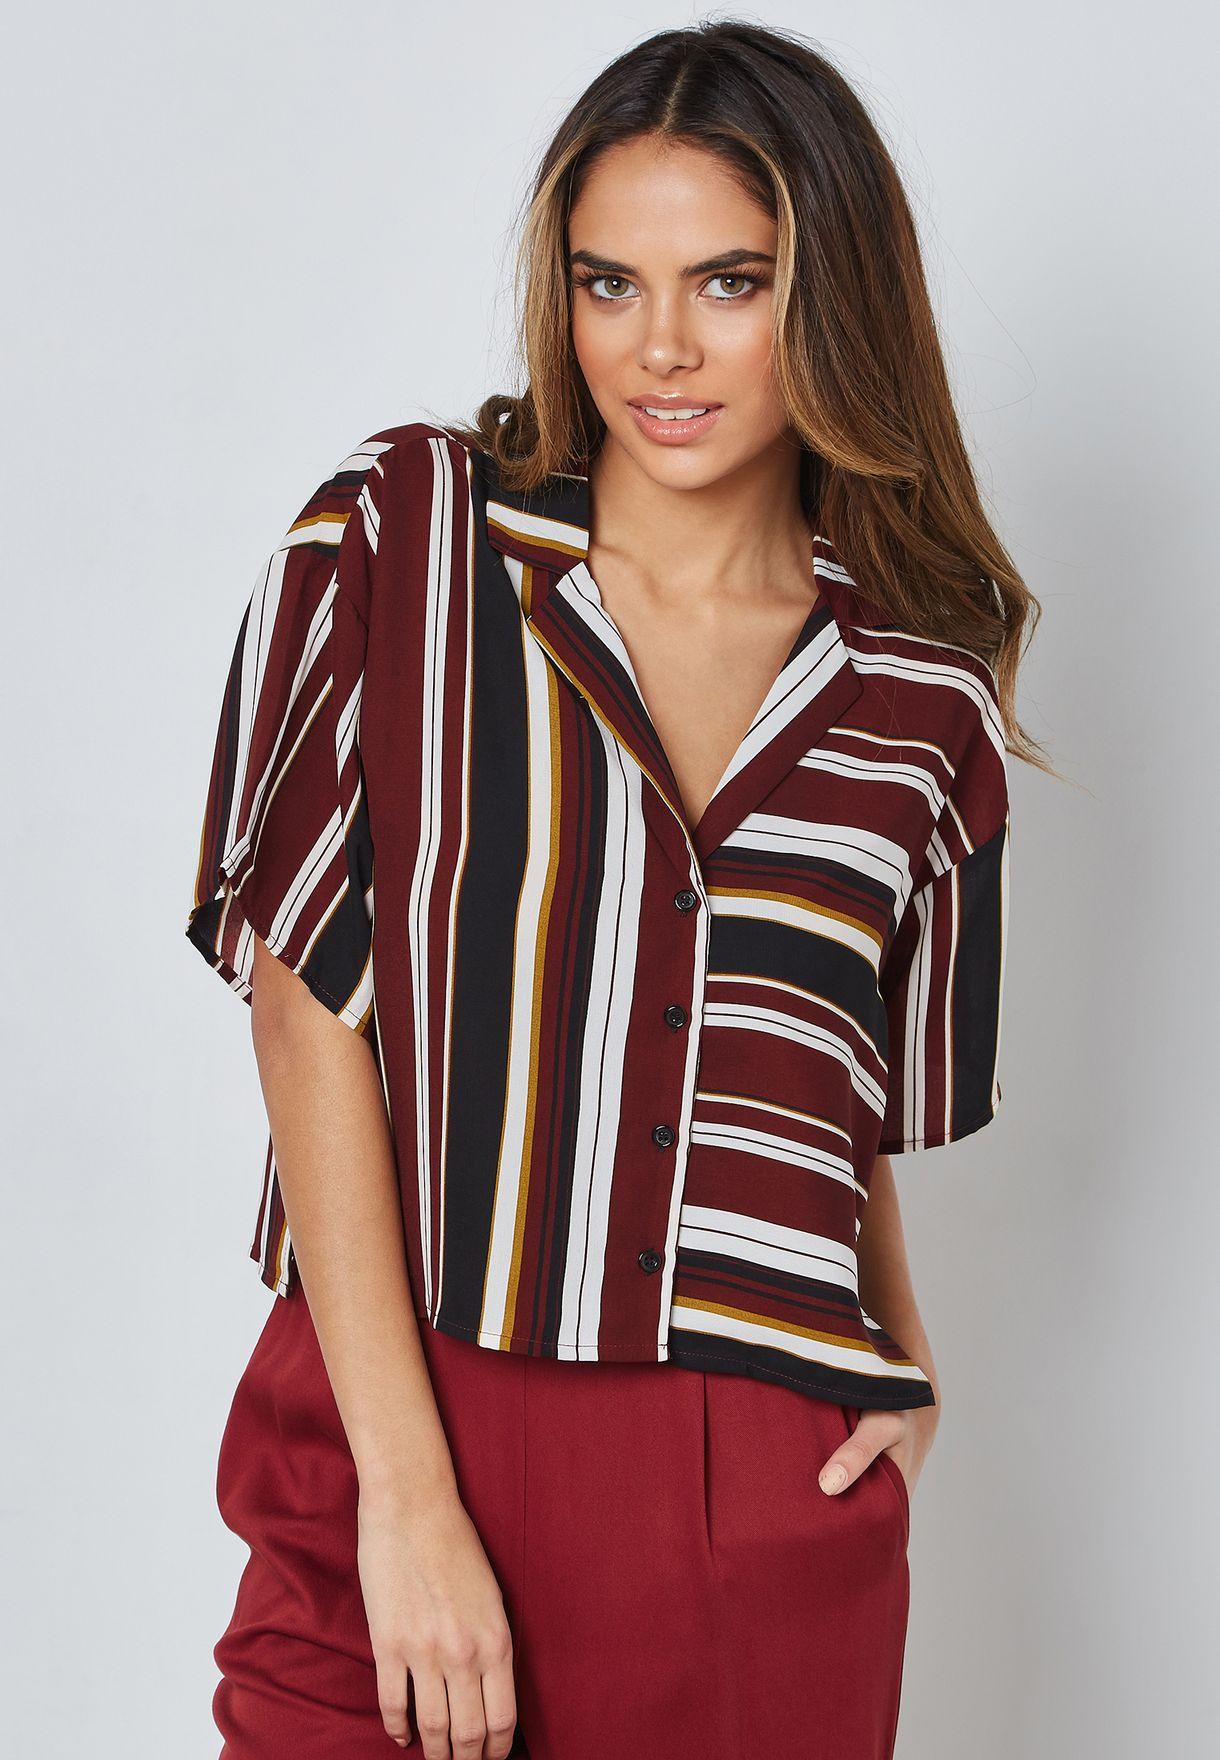 b58dff6115da Shop Forever 21 prints Striped Short Sleeve Shirt 302877 for Women ...